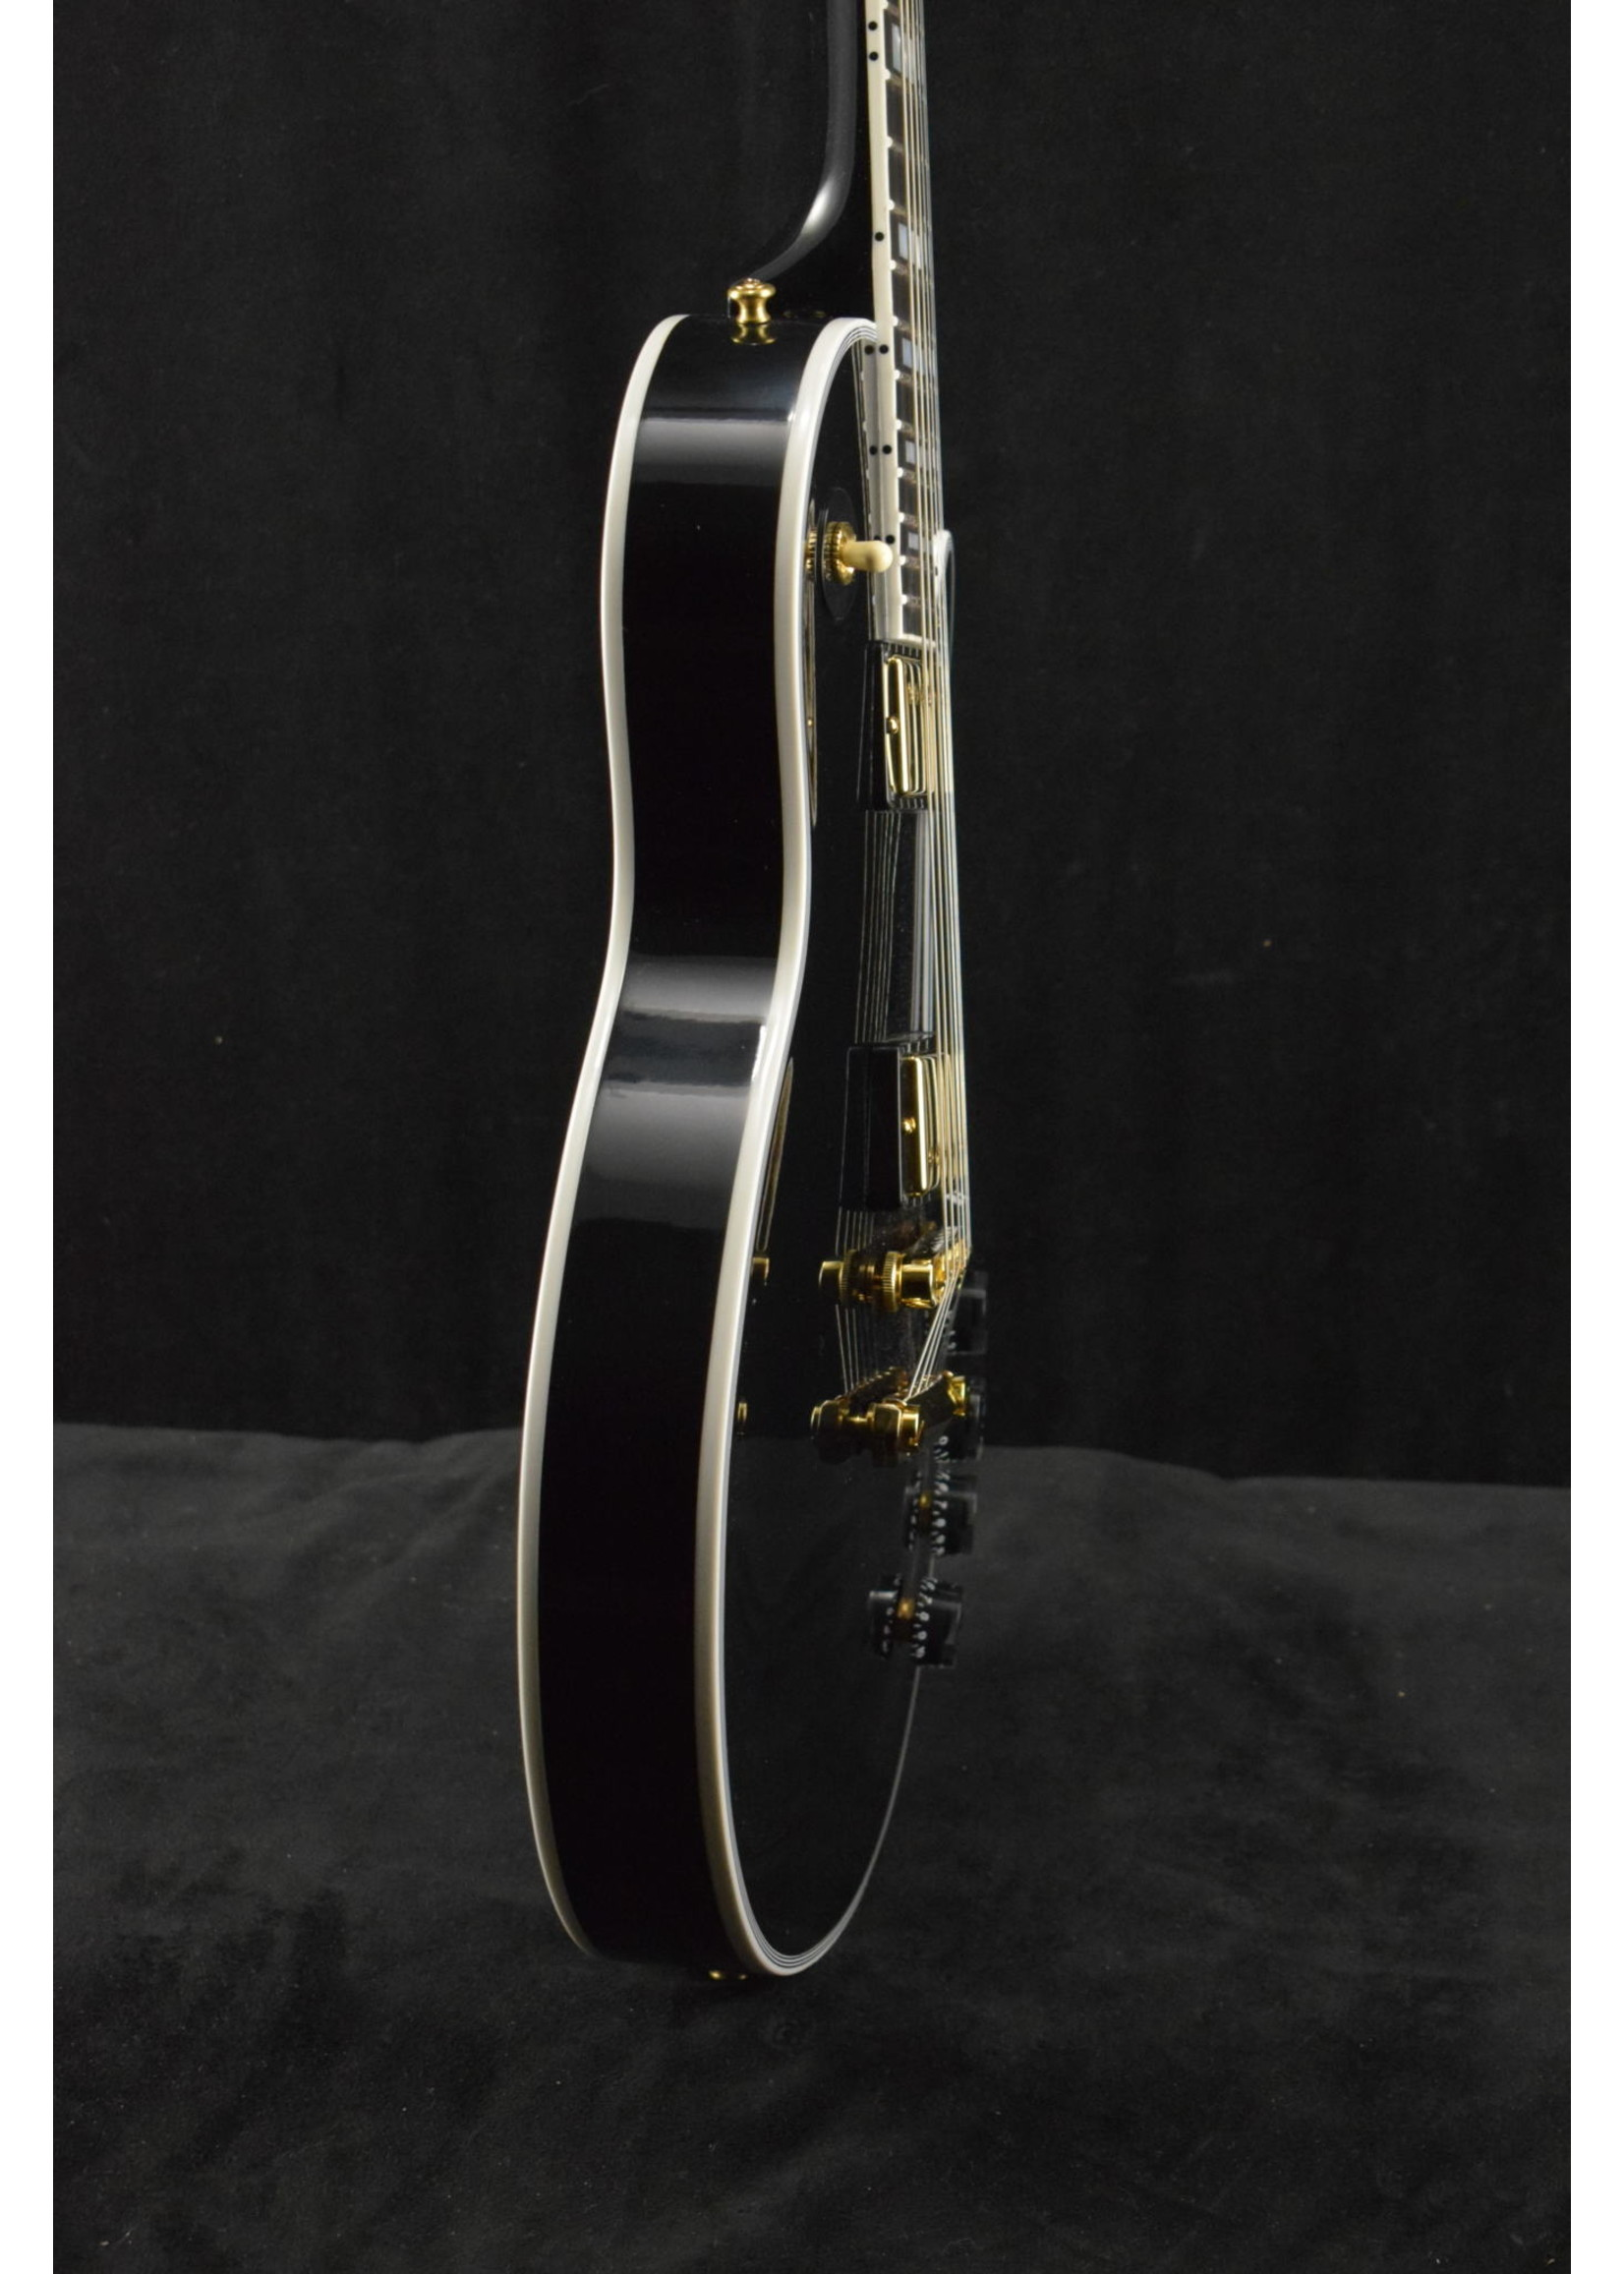 Gibson Gibson Custom Shop Les Paul Custom w/Ebony Fingerboard Gloss Ebony Finish